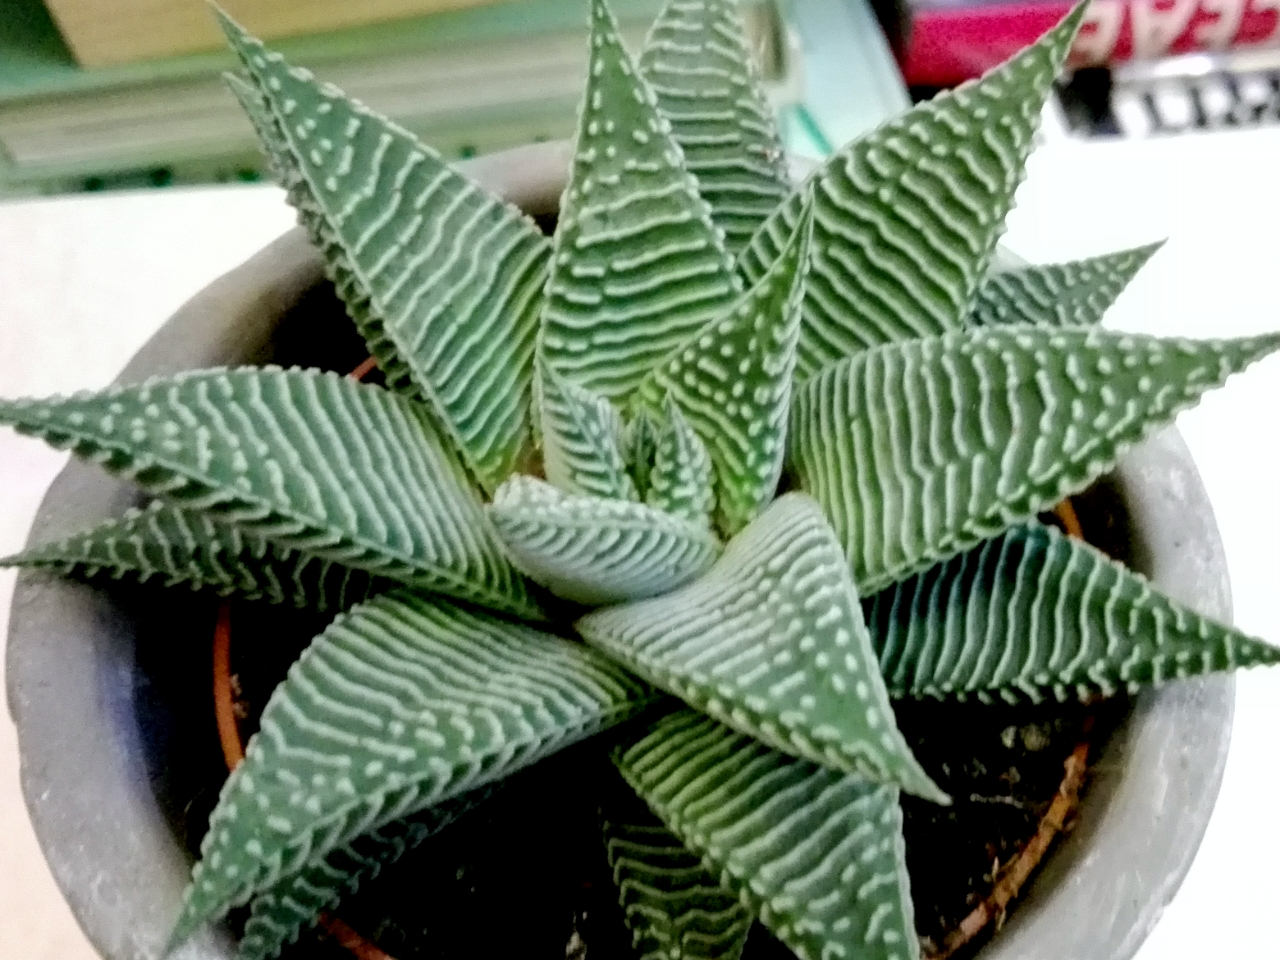 hawortia_limifolia_spide-1